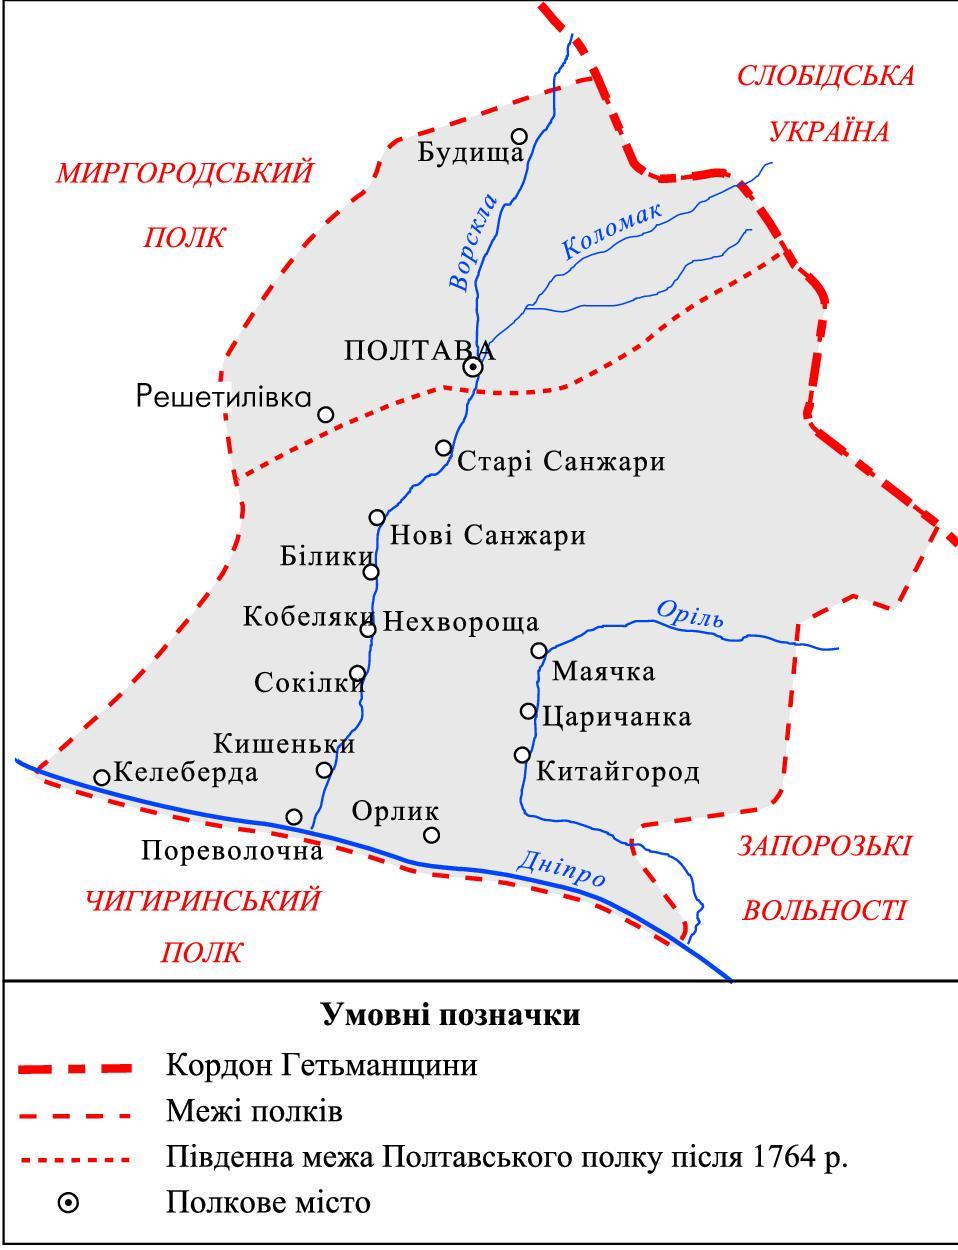 http://3.bp.blogspot.com/-oMUMmkfLpmM/Tfdt_EAd3qI/AAAAAAAAAFs/ZQKtljooNpg/s1600/Poltava.page1.jpg